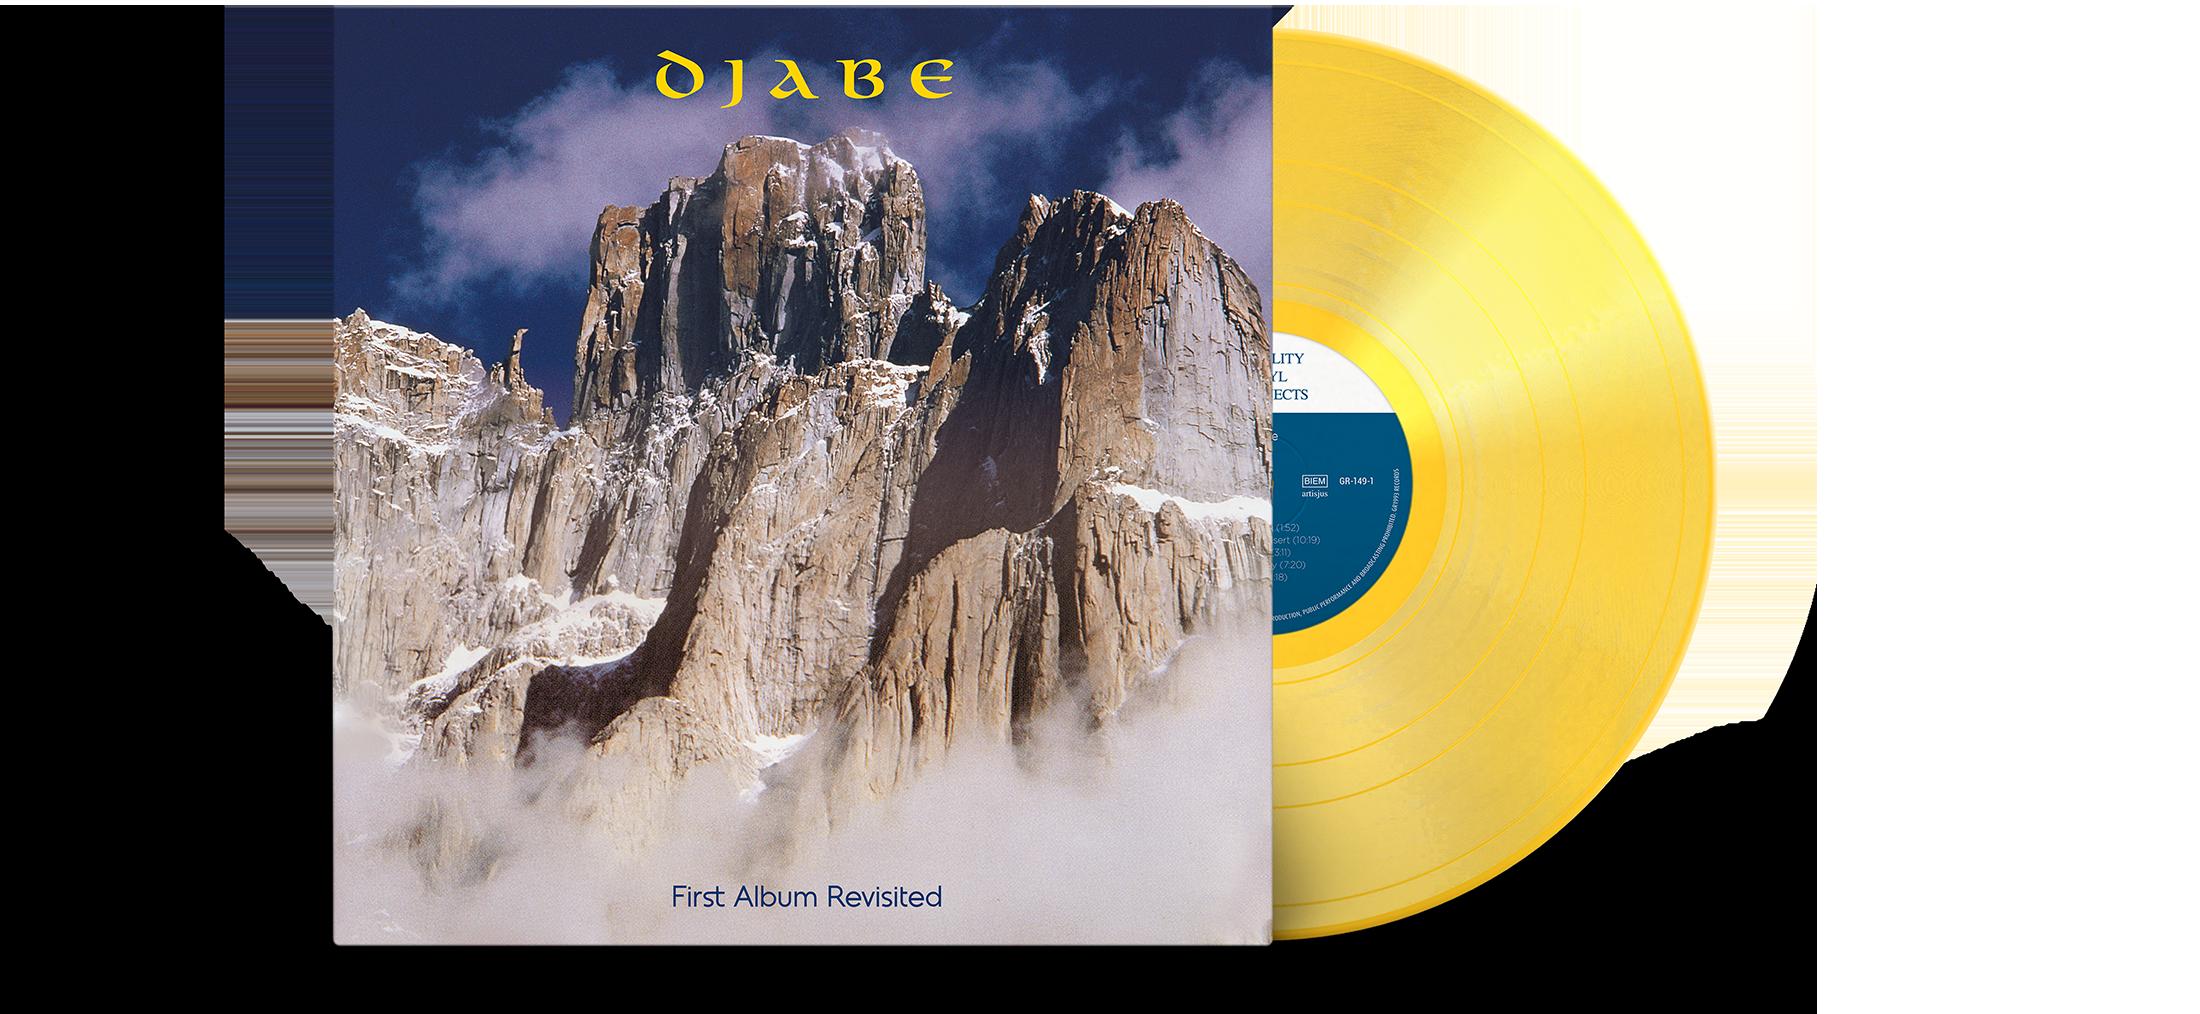 Djabe: First Album Revisited LP